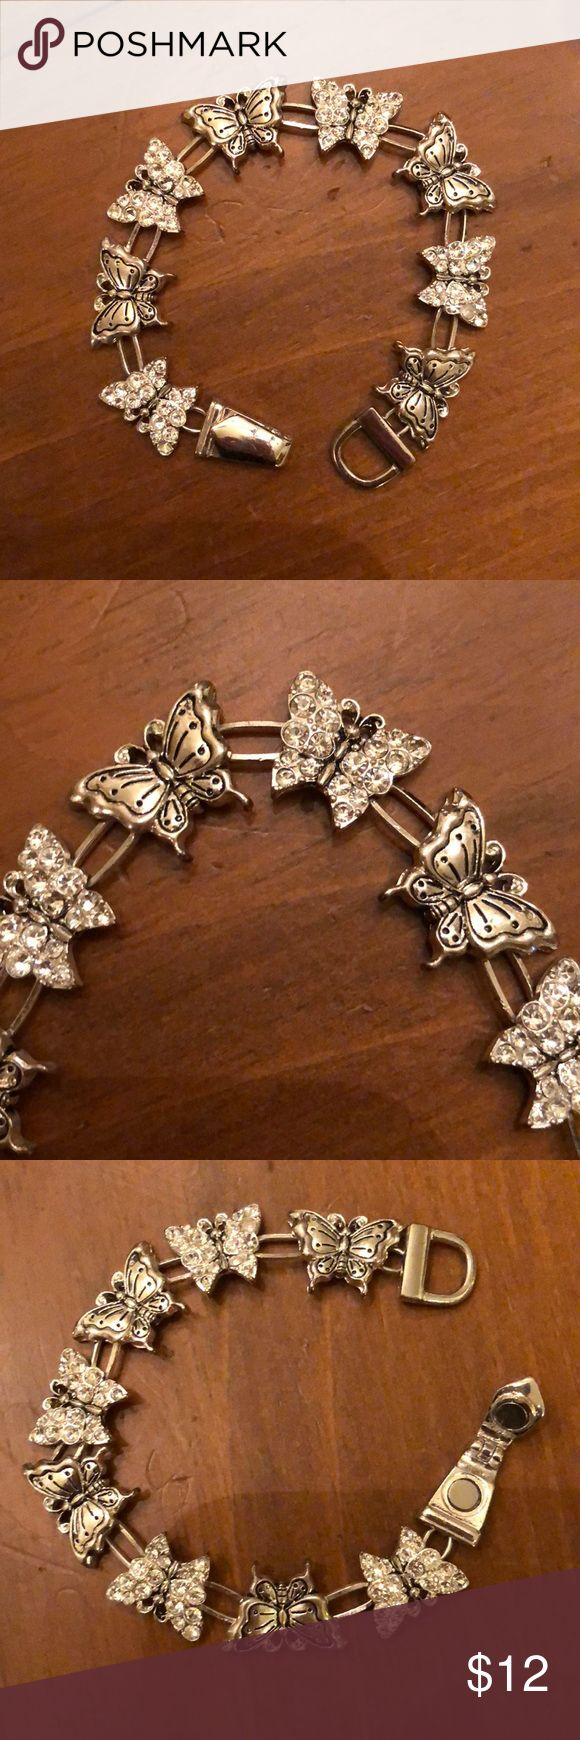 "🆕 SILVER BUTTERFLY BRACELET WITH RHINESTONES Silver Butterfly Bracelet➖Butterflies have Rhinestones➖7"" Bracelet➖Magnetic Closure➖Never Worn Jewelry Bracelets"